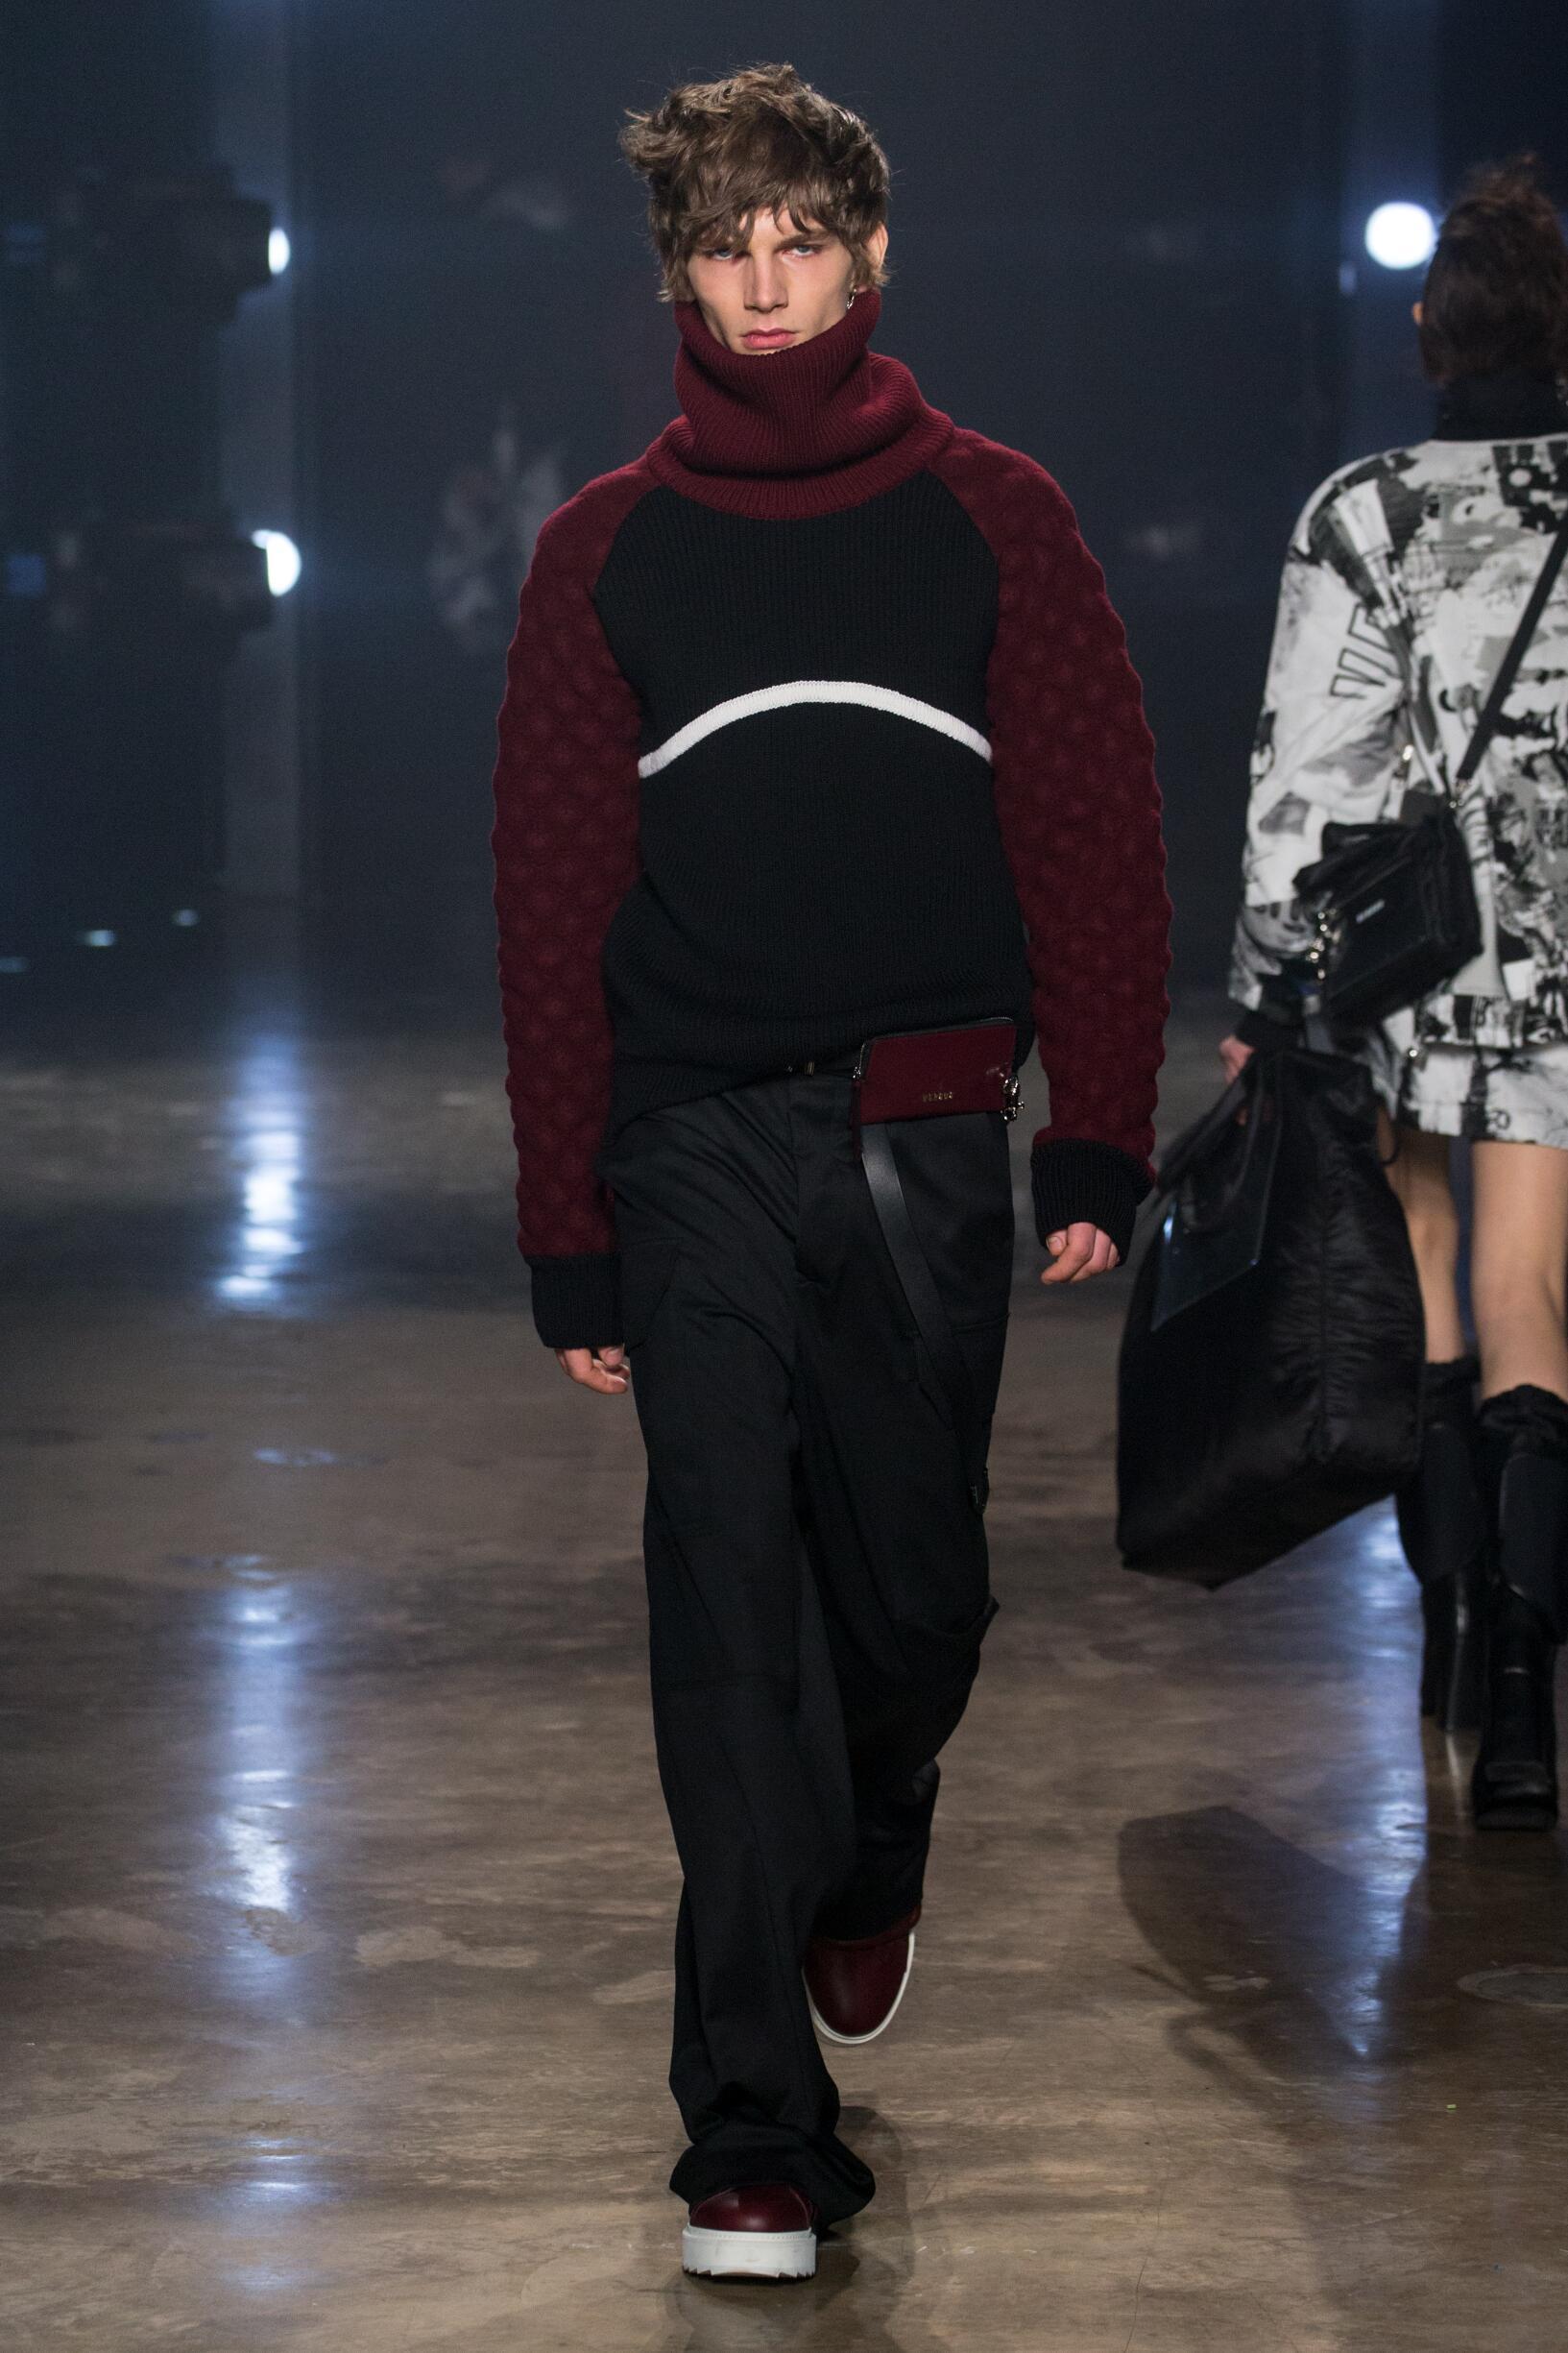 Fashion Man Model Versus Versace Catwalk 17-18